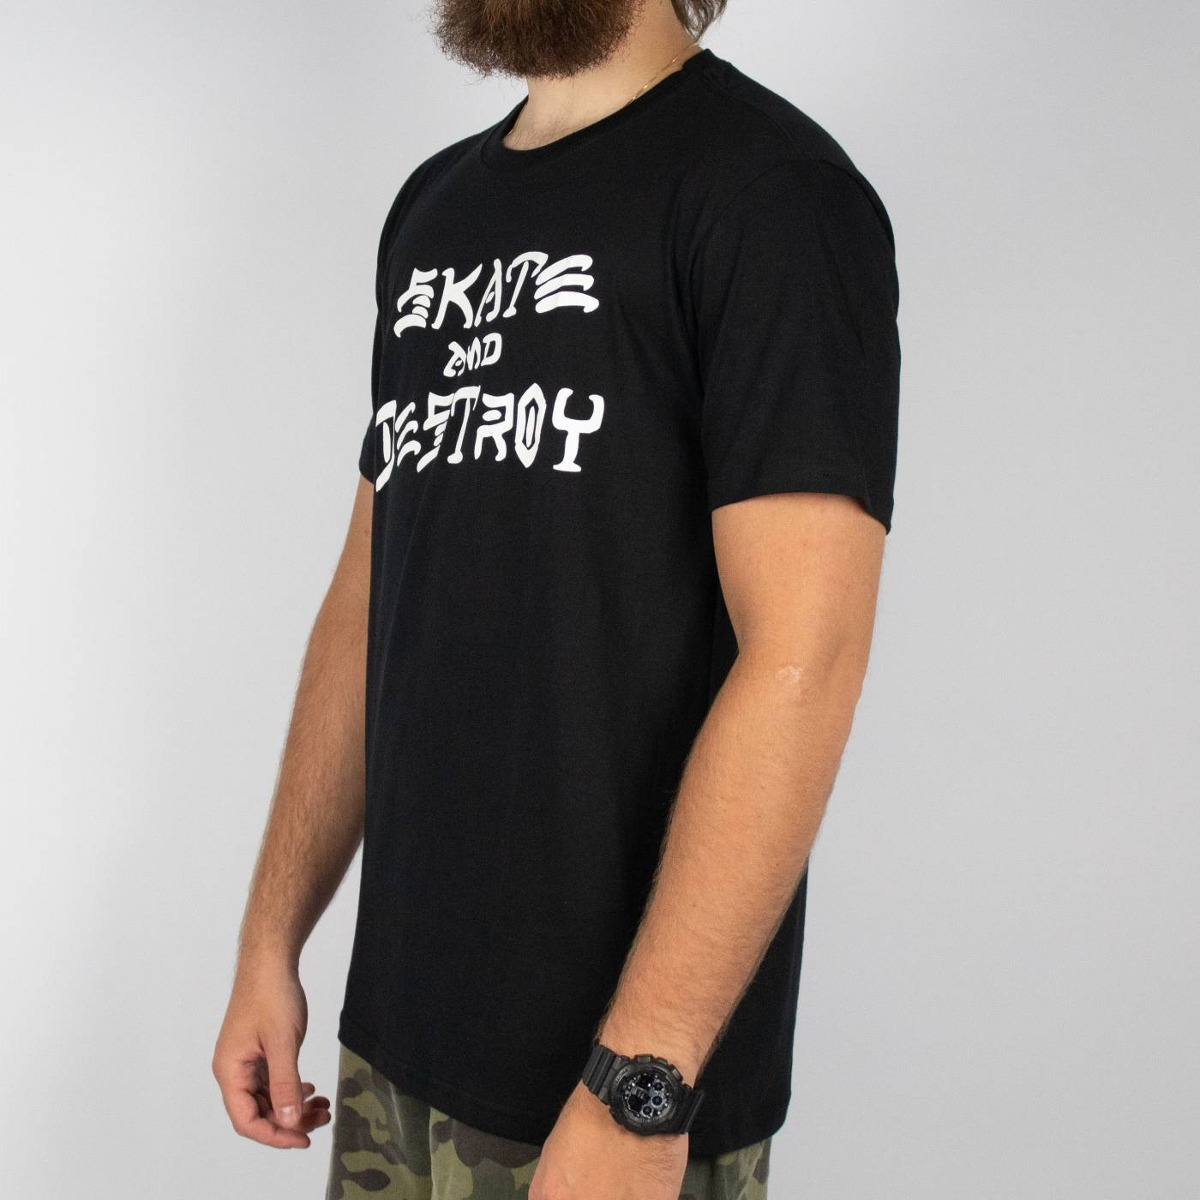 489557c87 camiseta thrasher sad preta original. Carregando zoom.